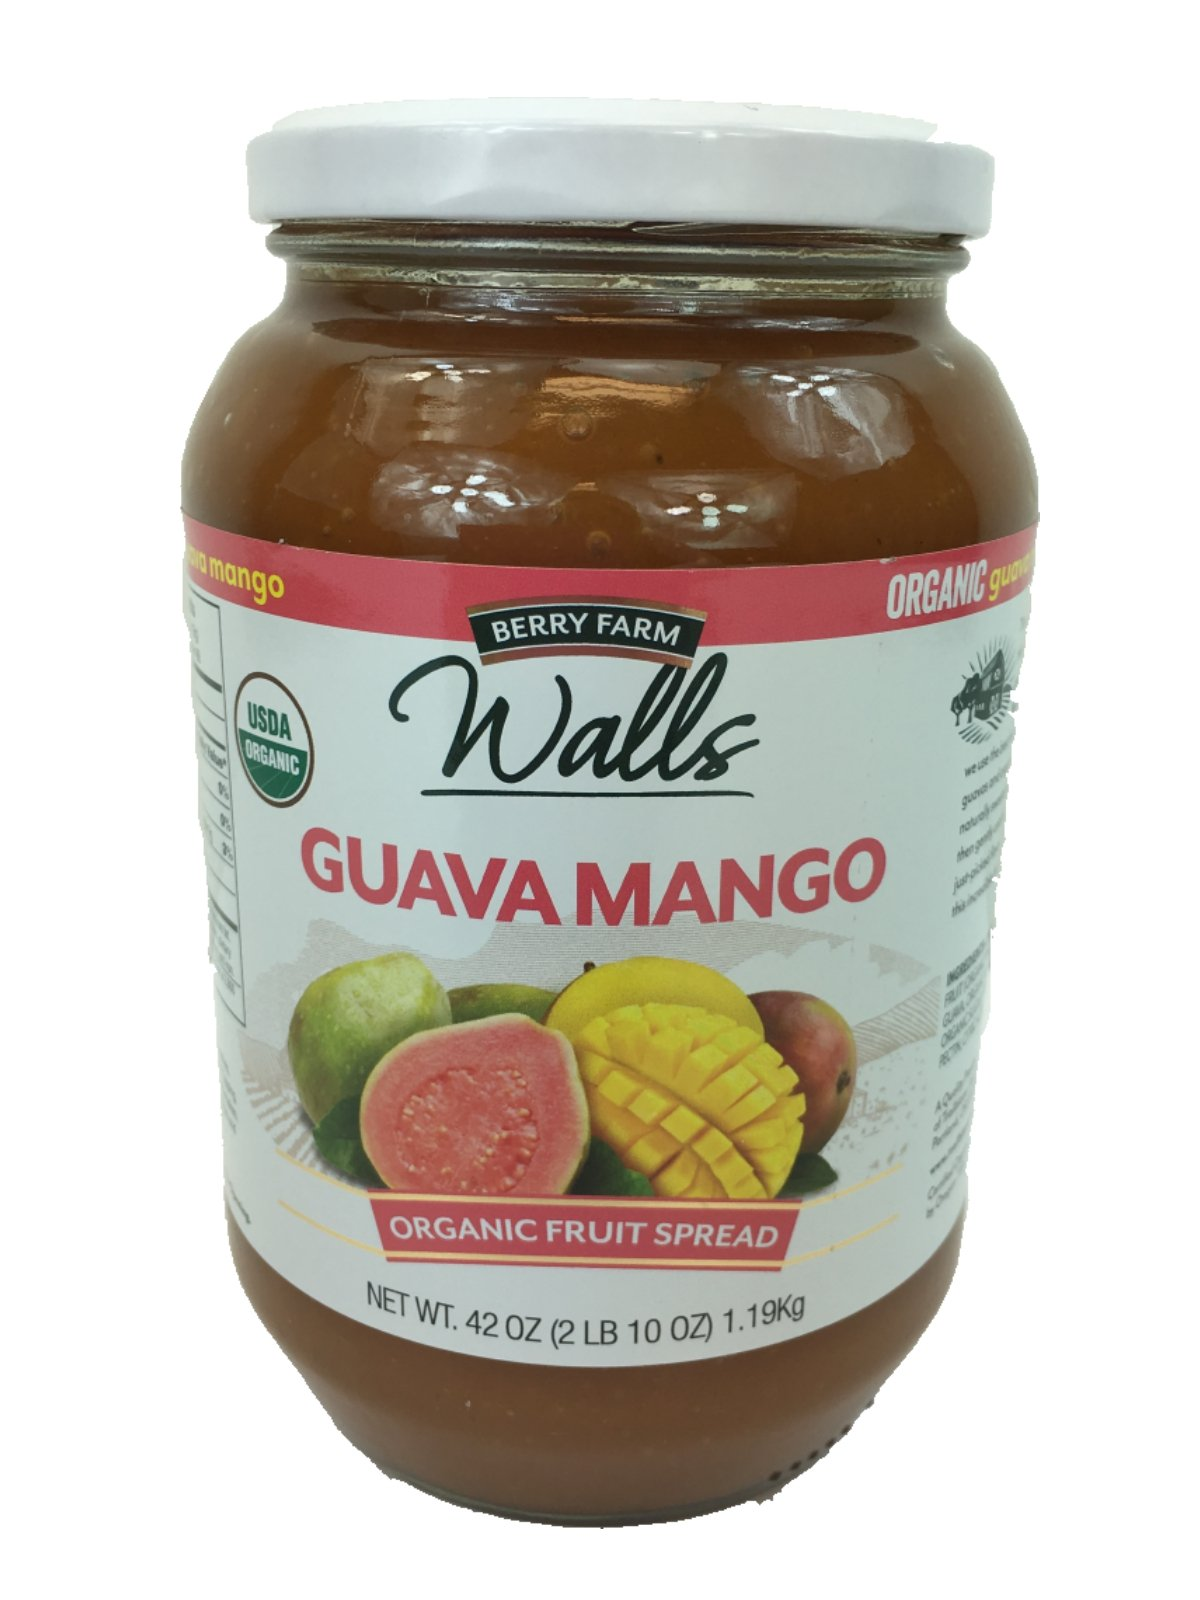 Wall Guava Mango Organic Fruit Spread